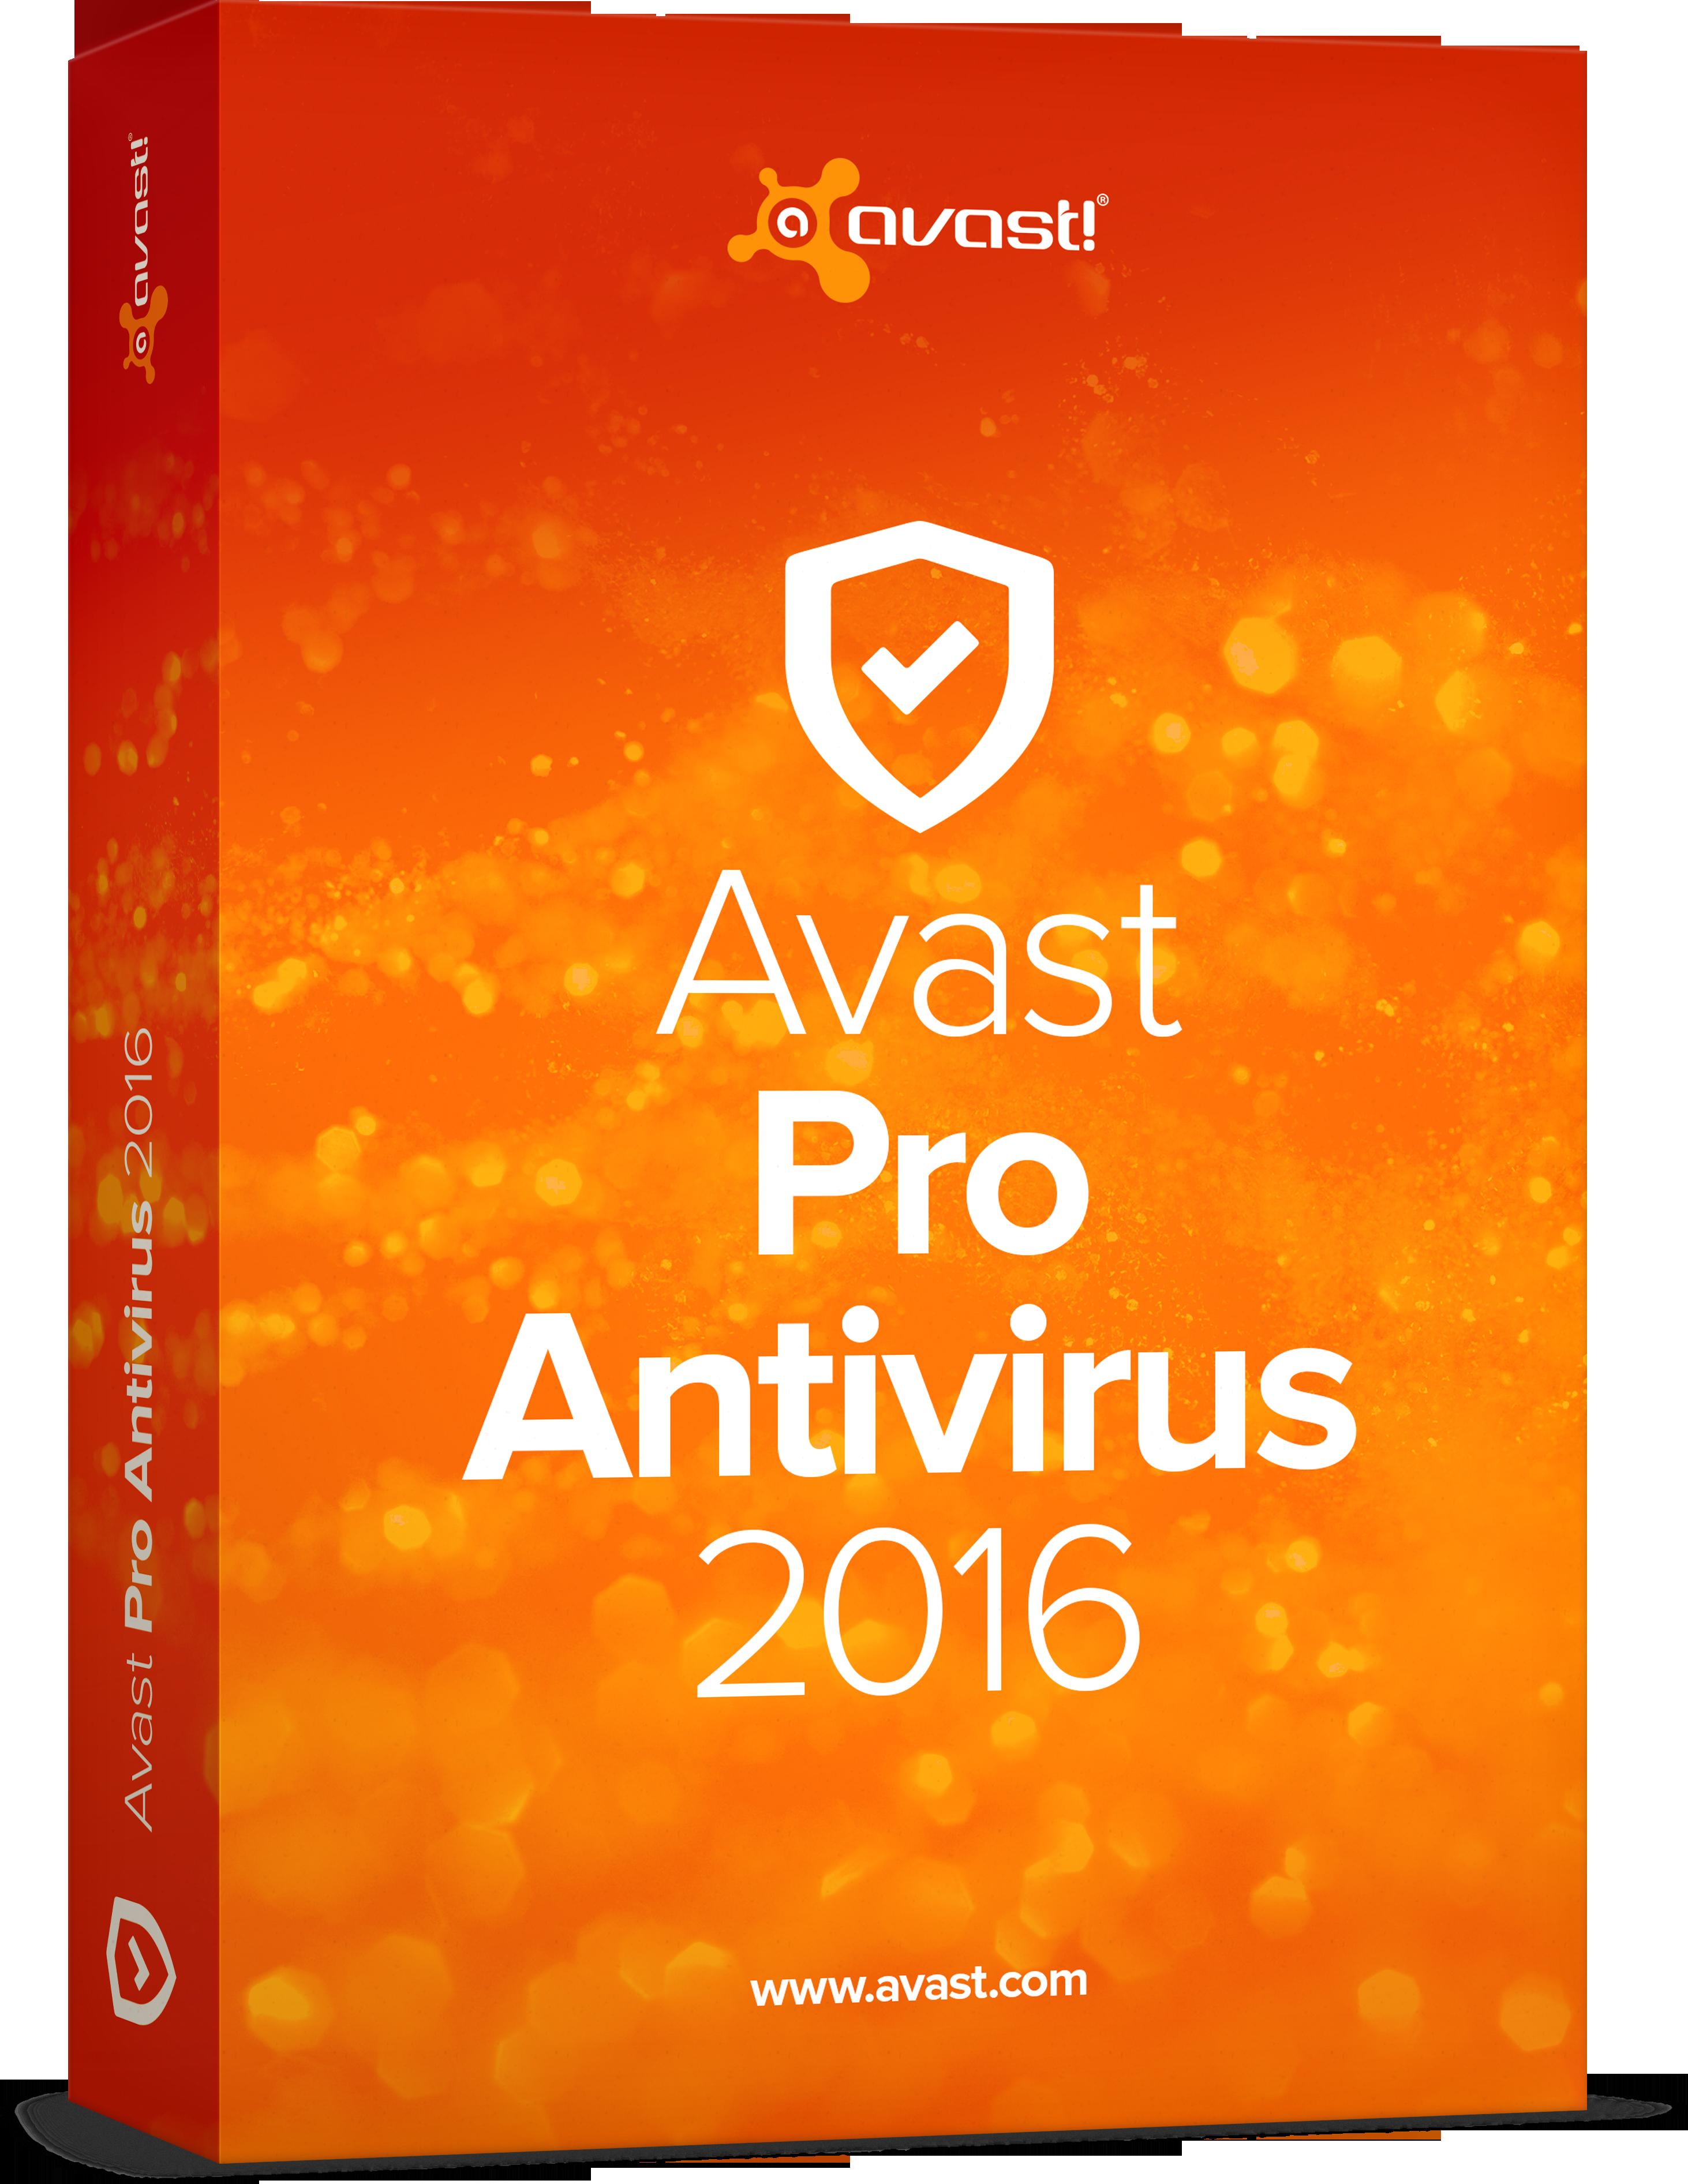 avast protect against malware